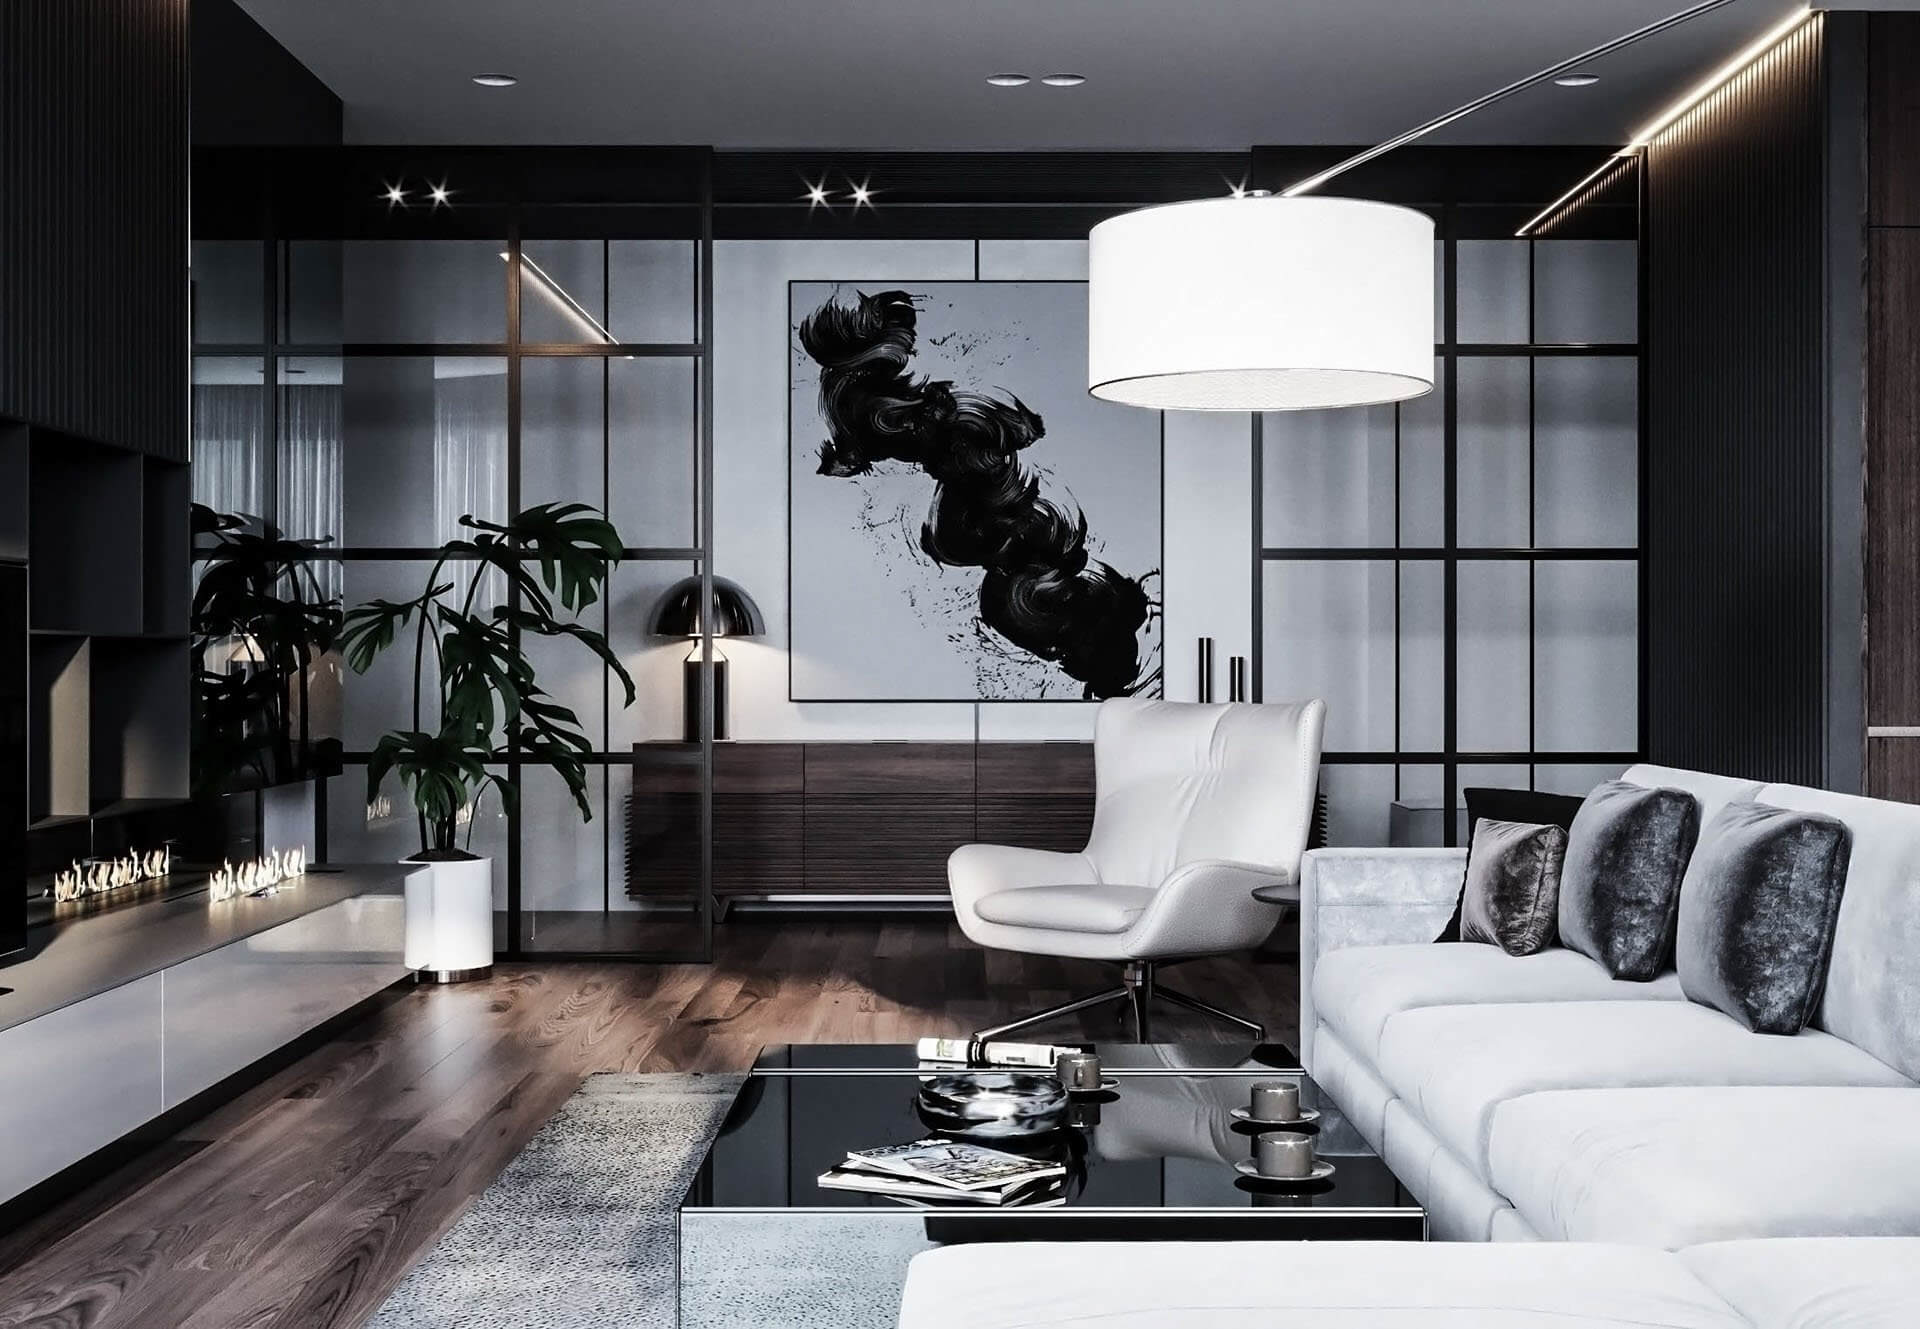 Dubrovka apartment living room 2 - cgi visualization